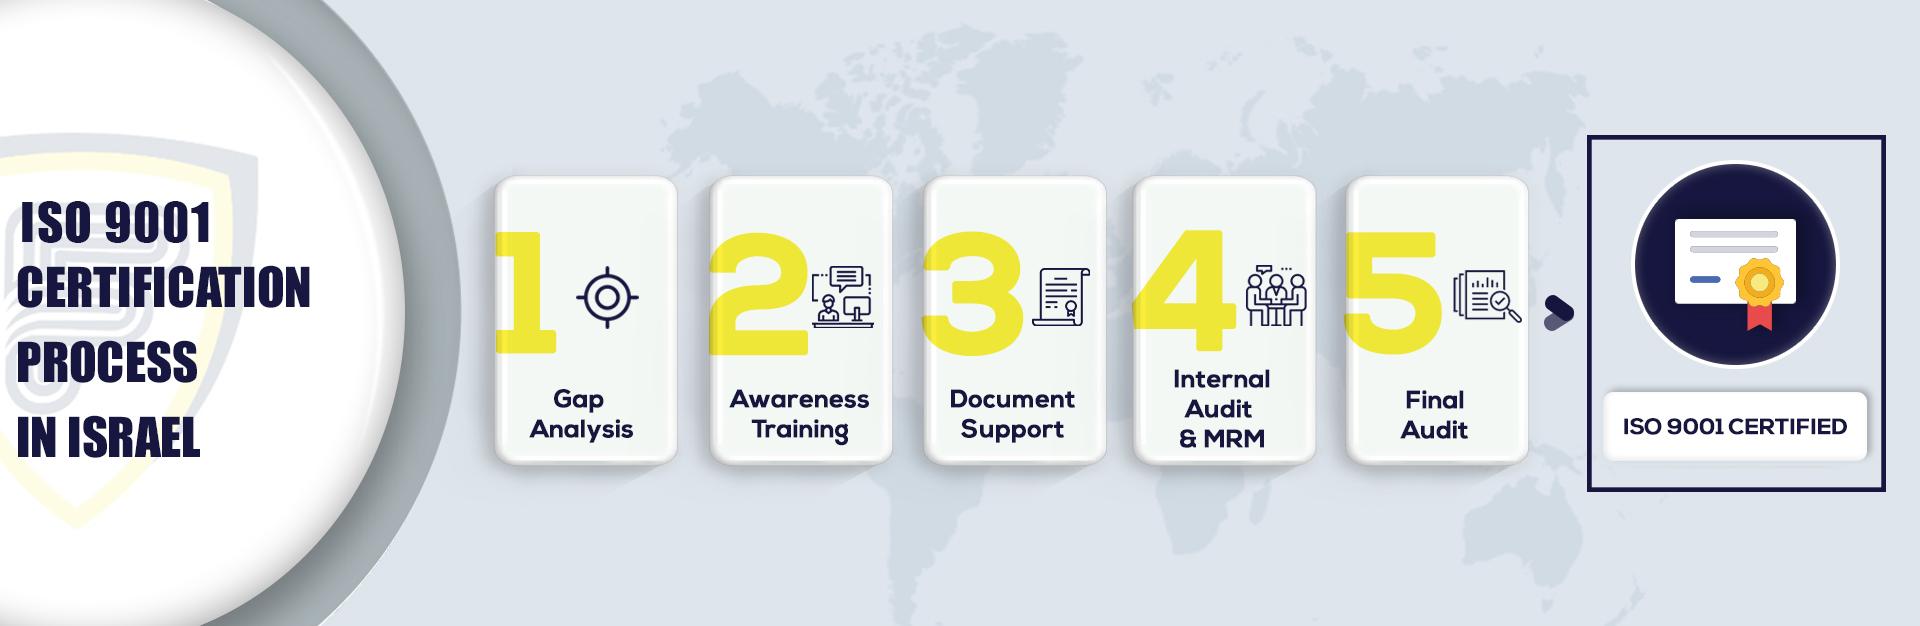 ISO 9001 Certification in Israel